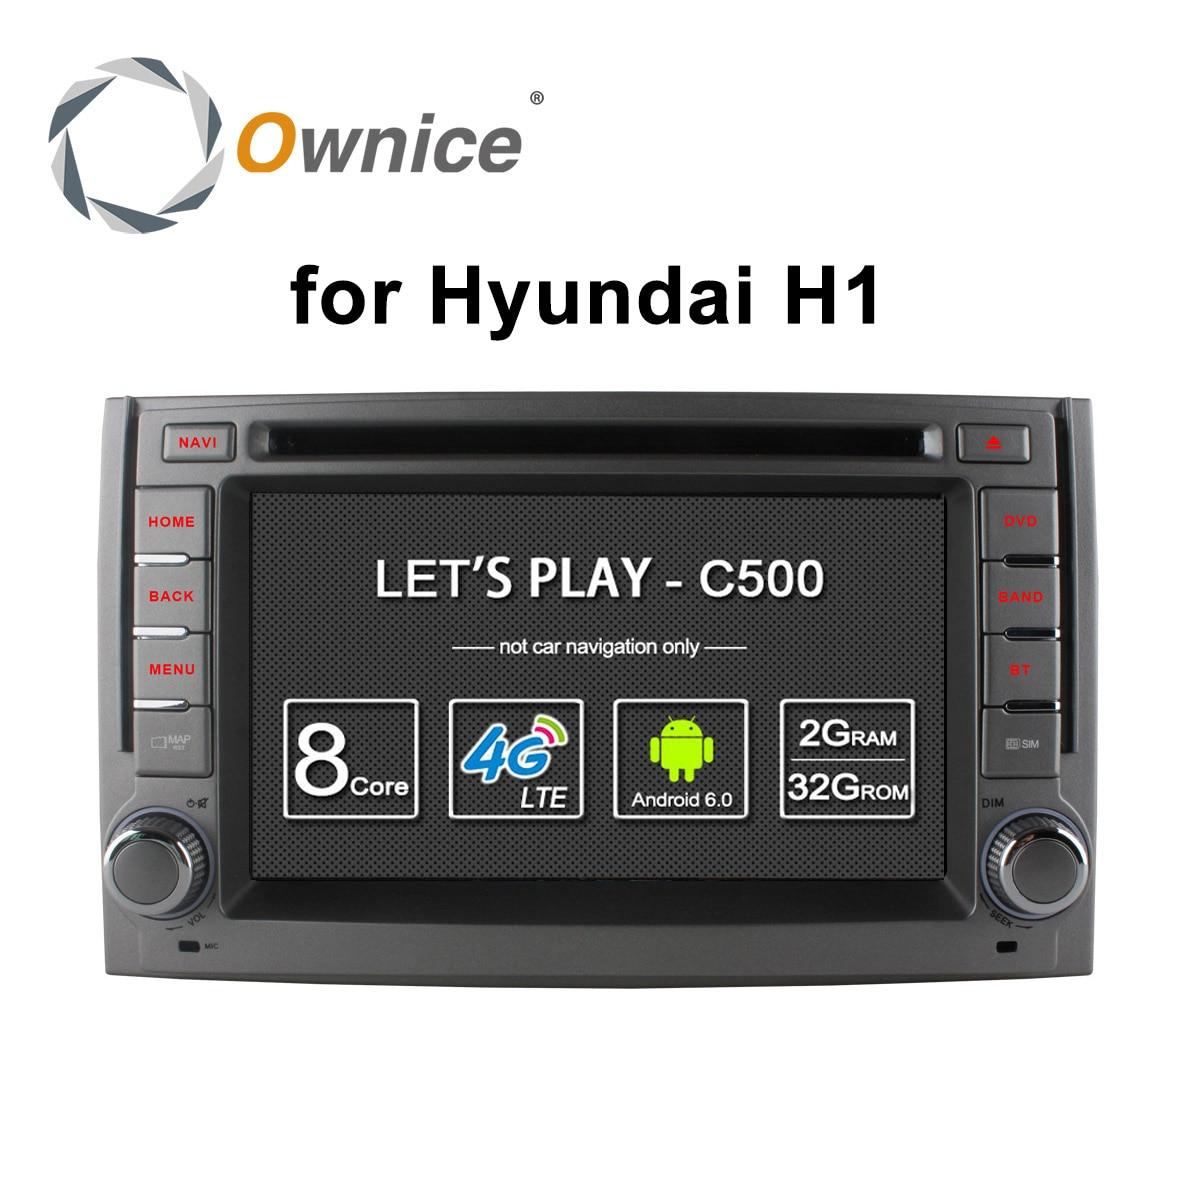 4G SIM LTE Octa Core Android 6.0 Car DVD player GPS Navi for Hyundai H1 Grand Starex 2007 - 2015 2GB RAM  16GB ROM support DAB+